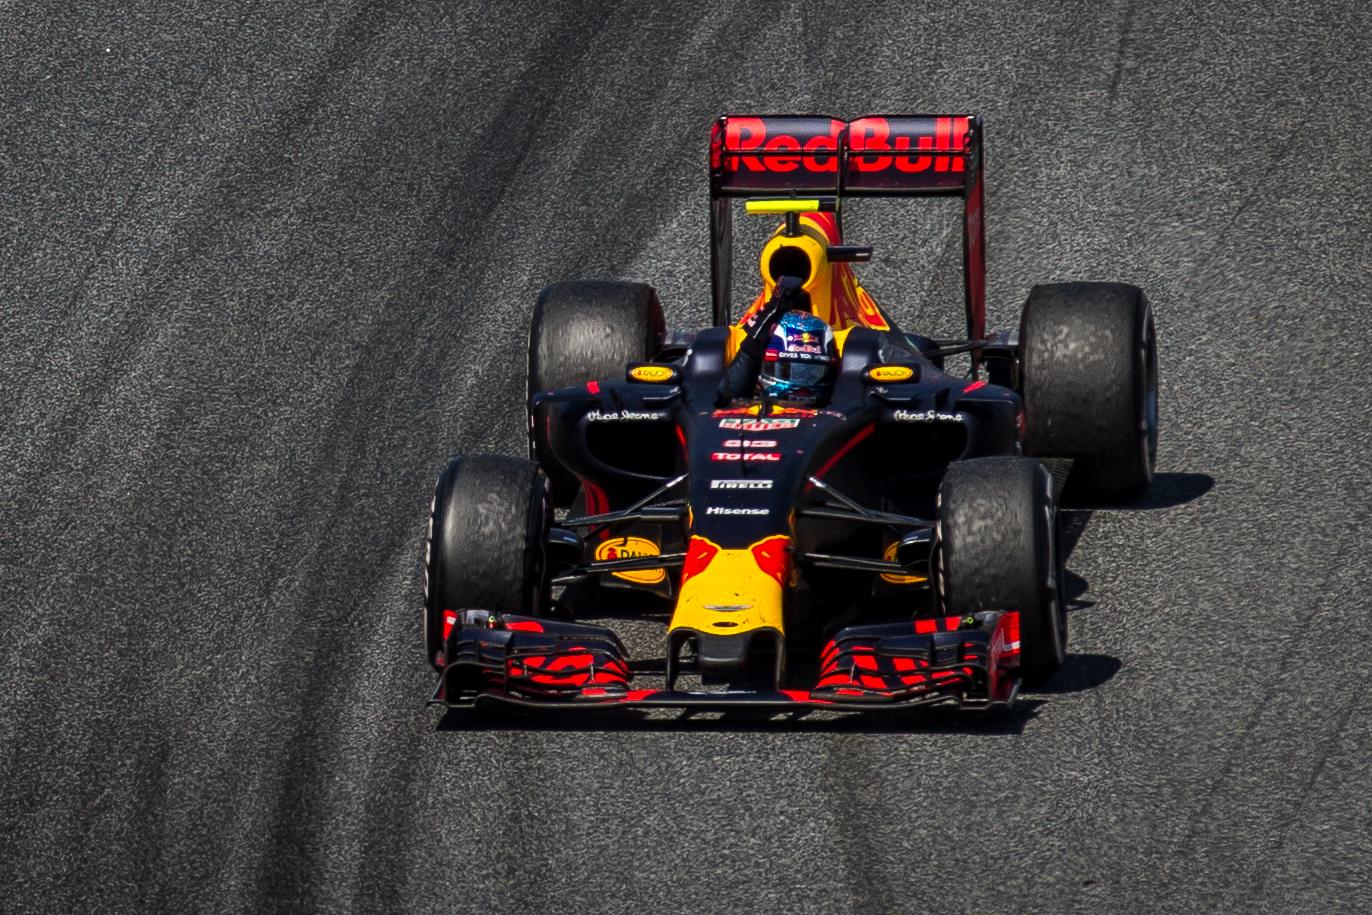 Max Verstappen driving a Red Bull Formula 1 car.